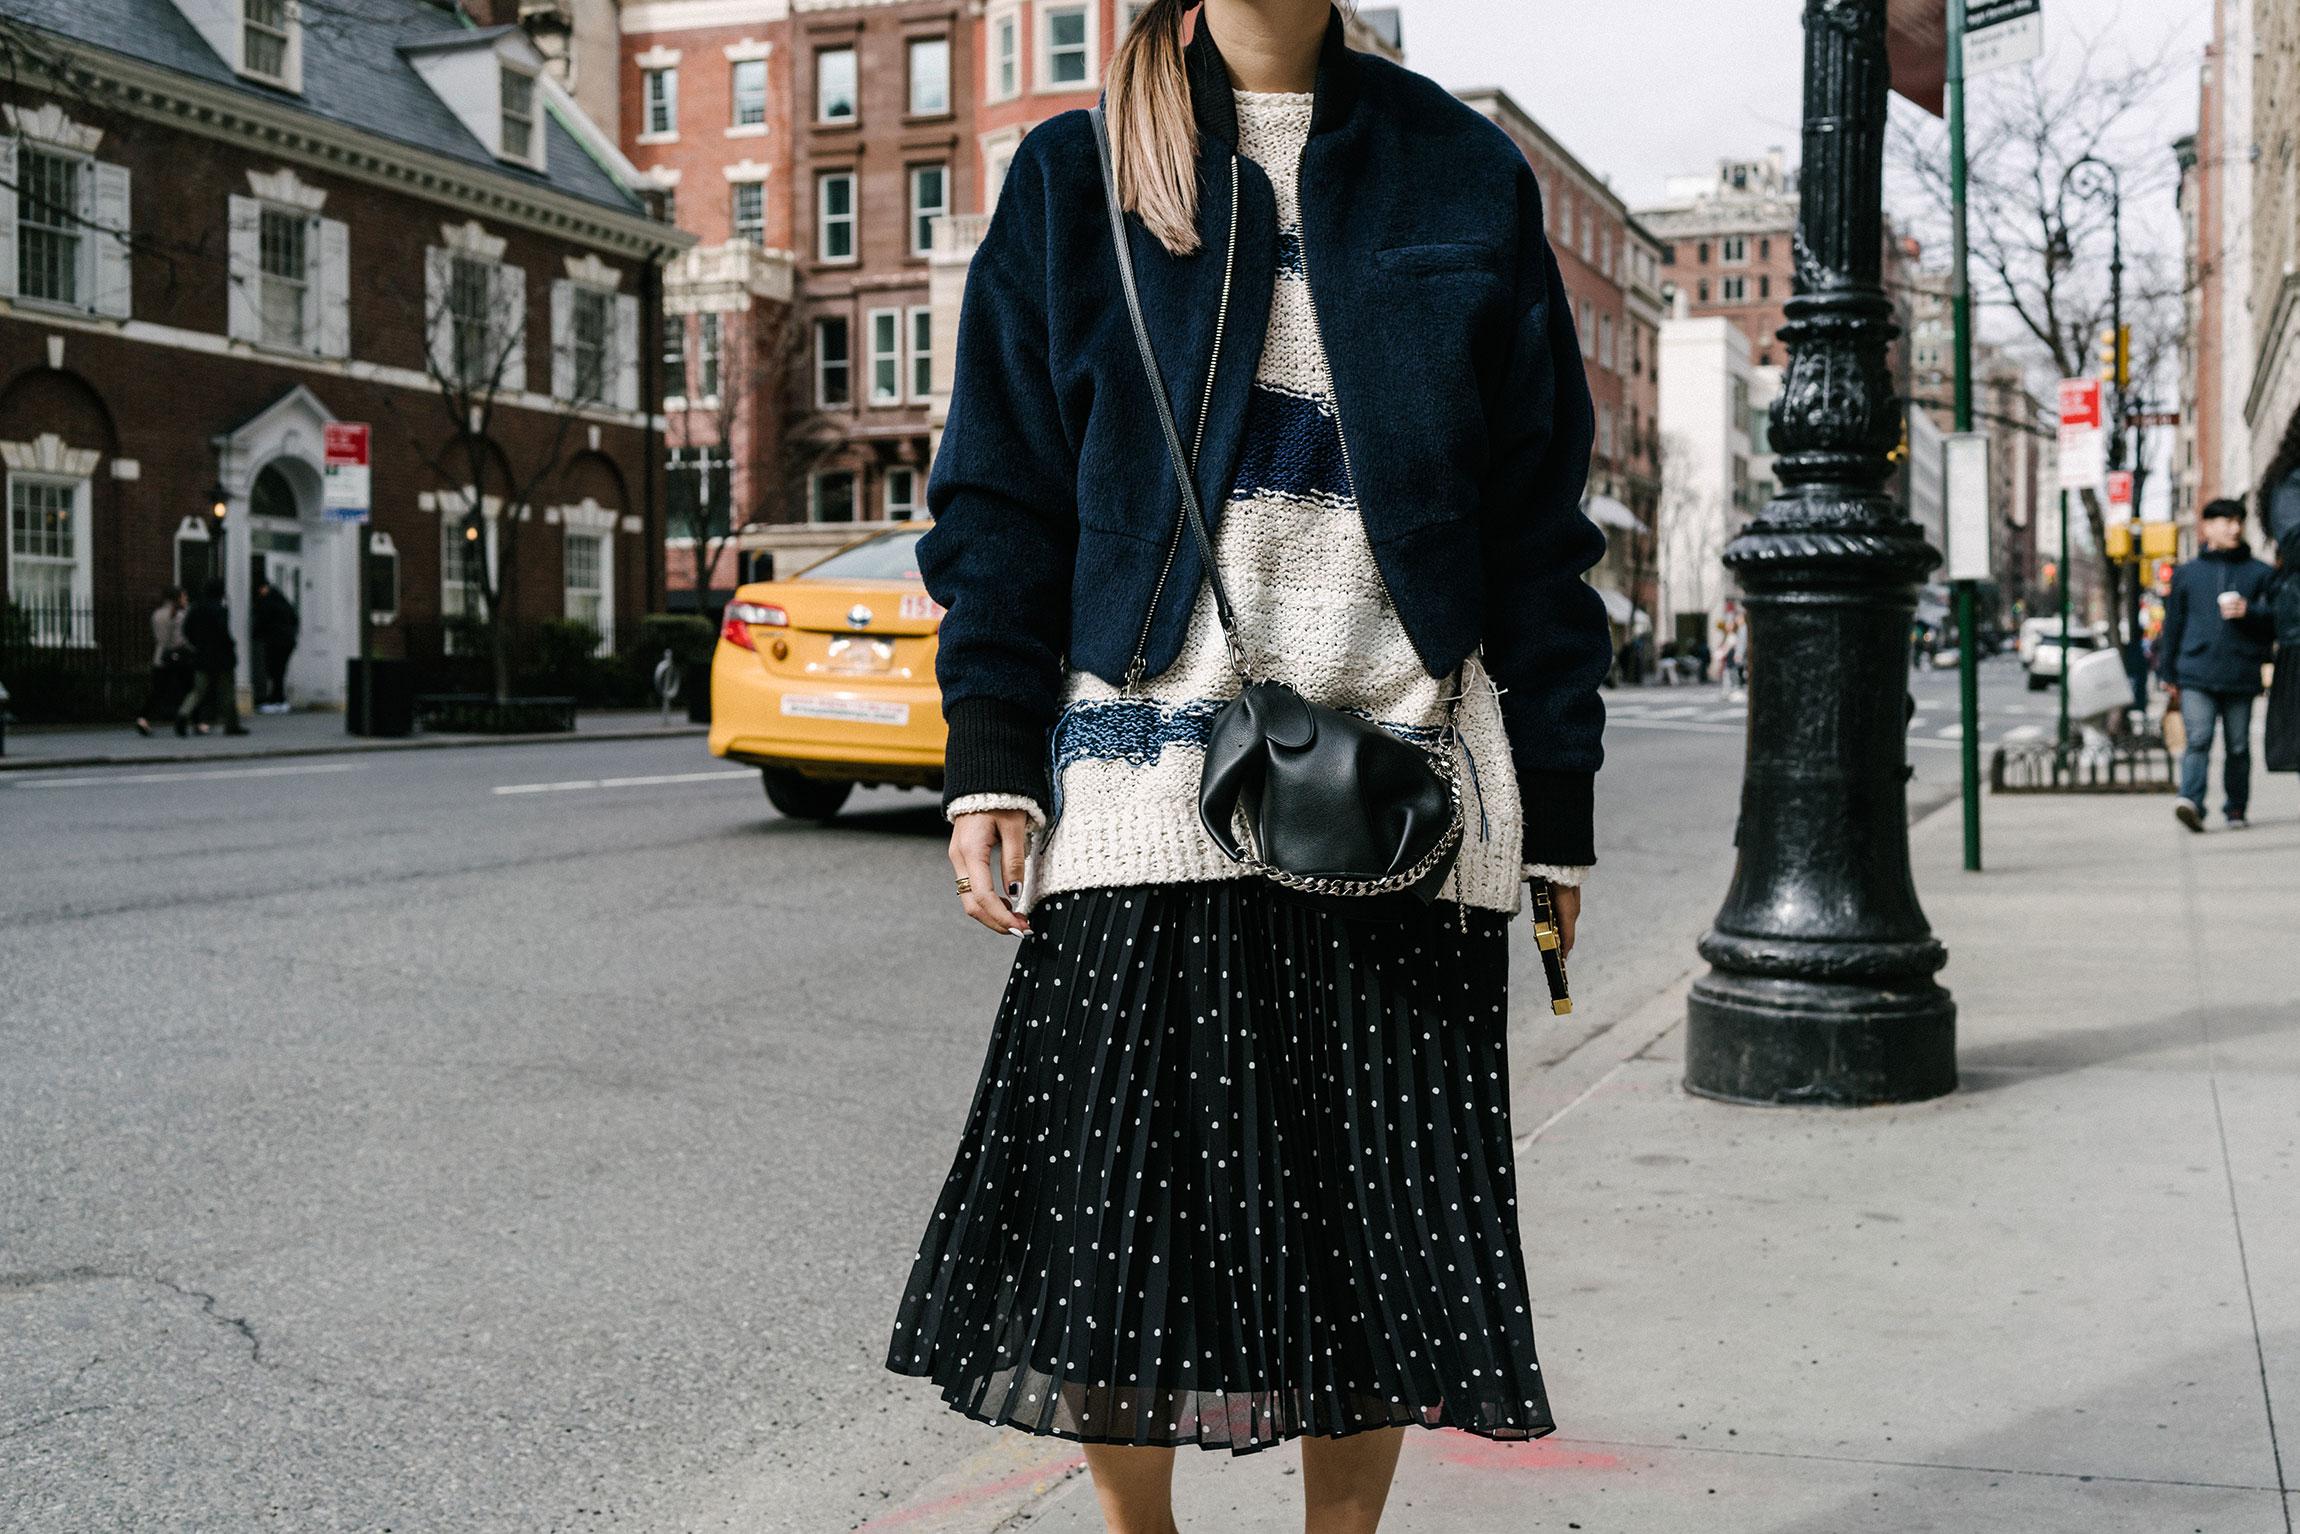 Cienne NY Jacket ,  Tomorrowland Sweater ,  Sézane Skirt ,  The Row Shoes ,  Loewe Bag ,  Louis Vuitton Case , COS Beanie